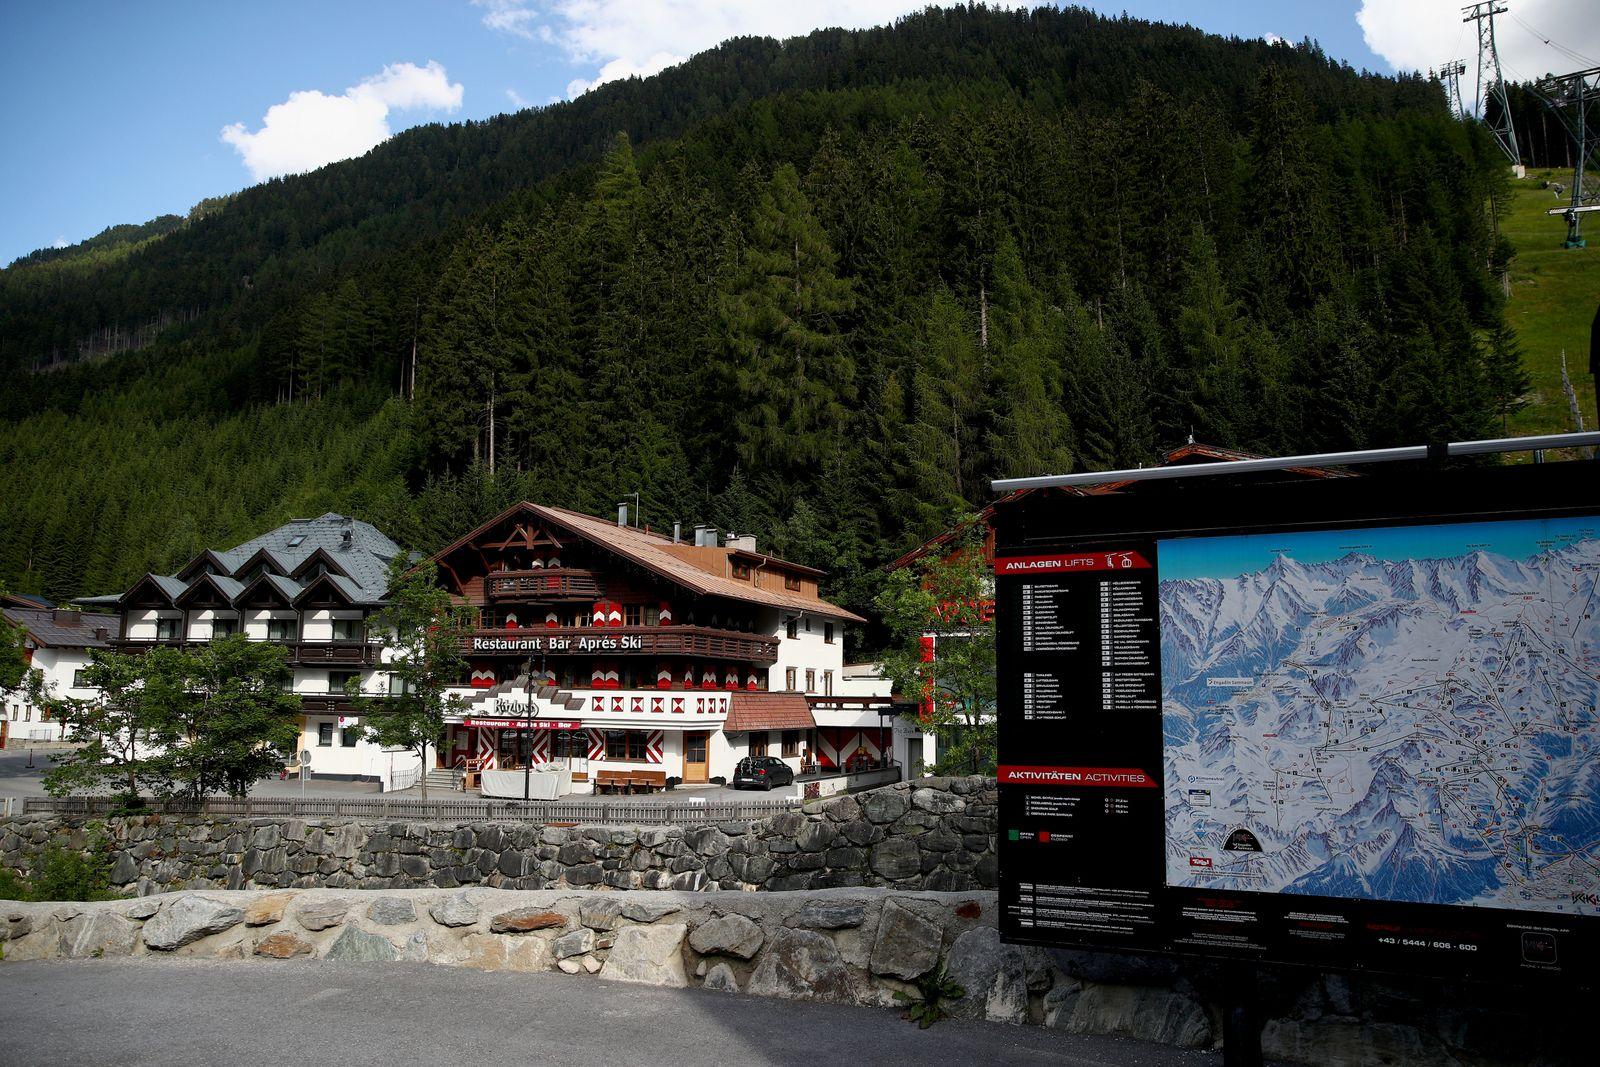 A general view of the Kitzloch apres-ski bar in Ischgl